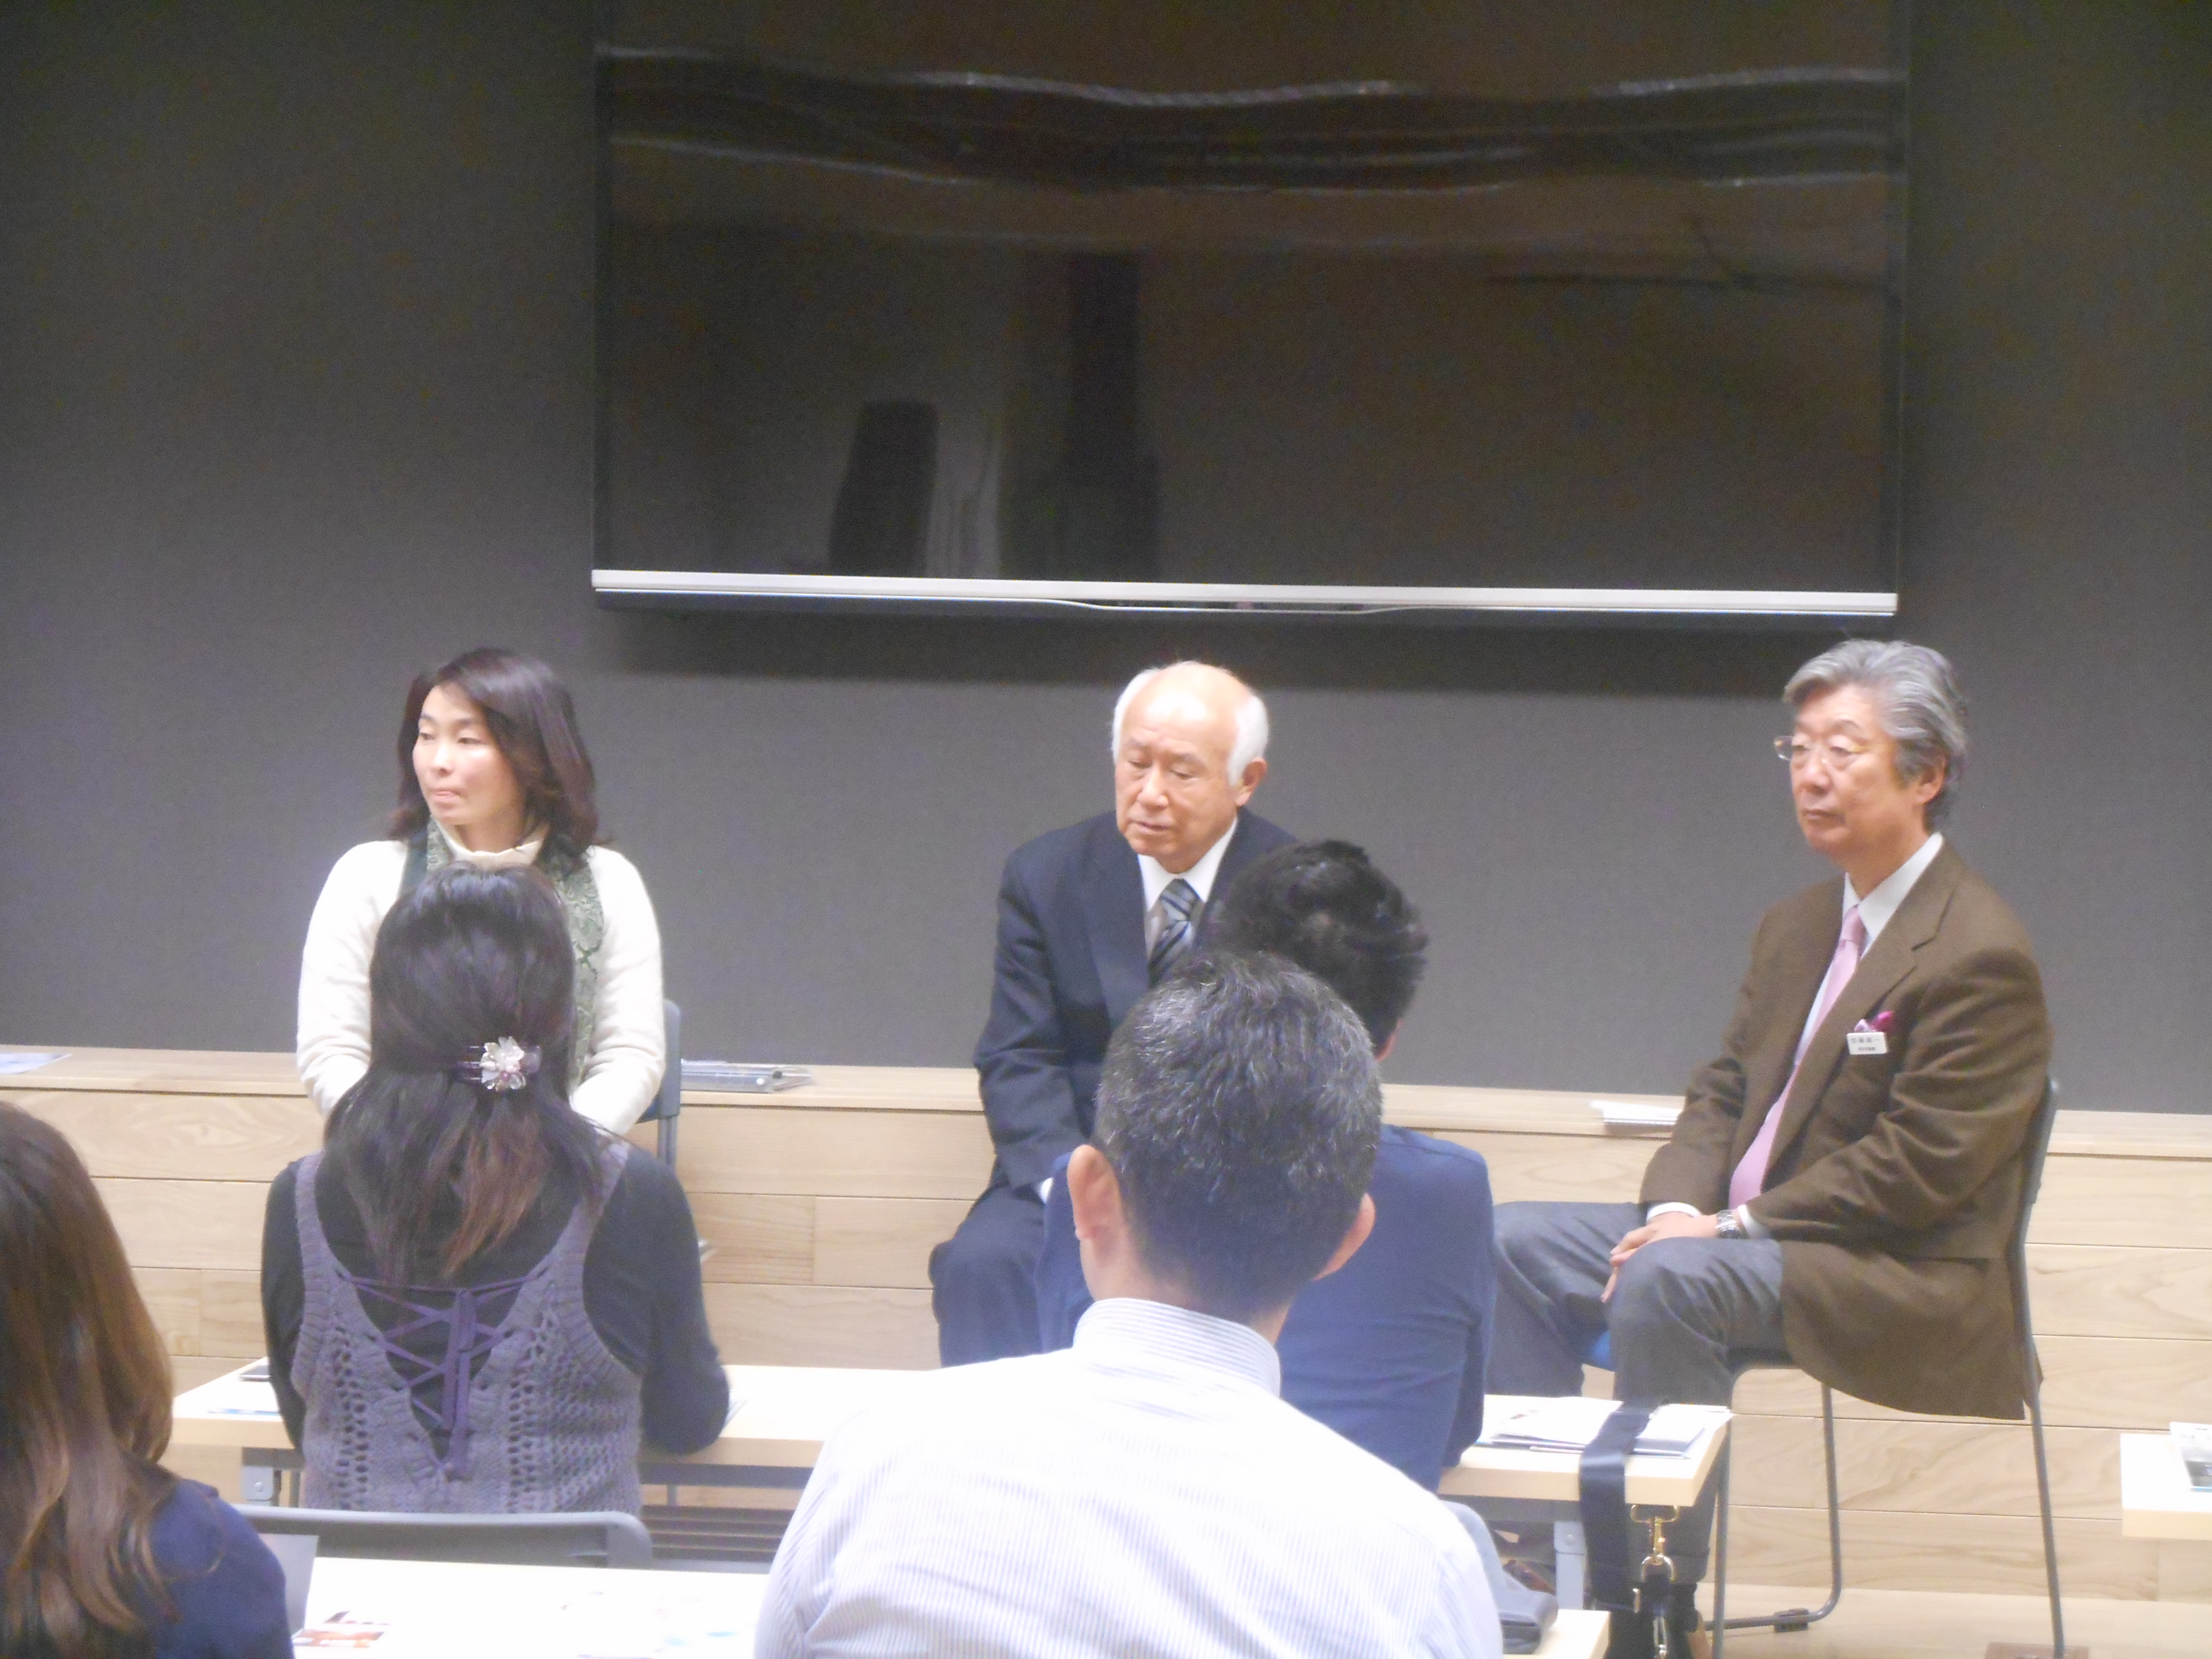 DSCN0460 - 4月1日東京思風塾の開催になります。